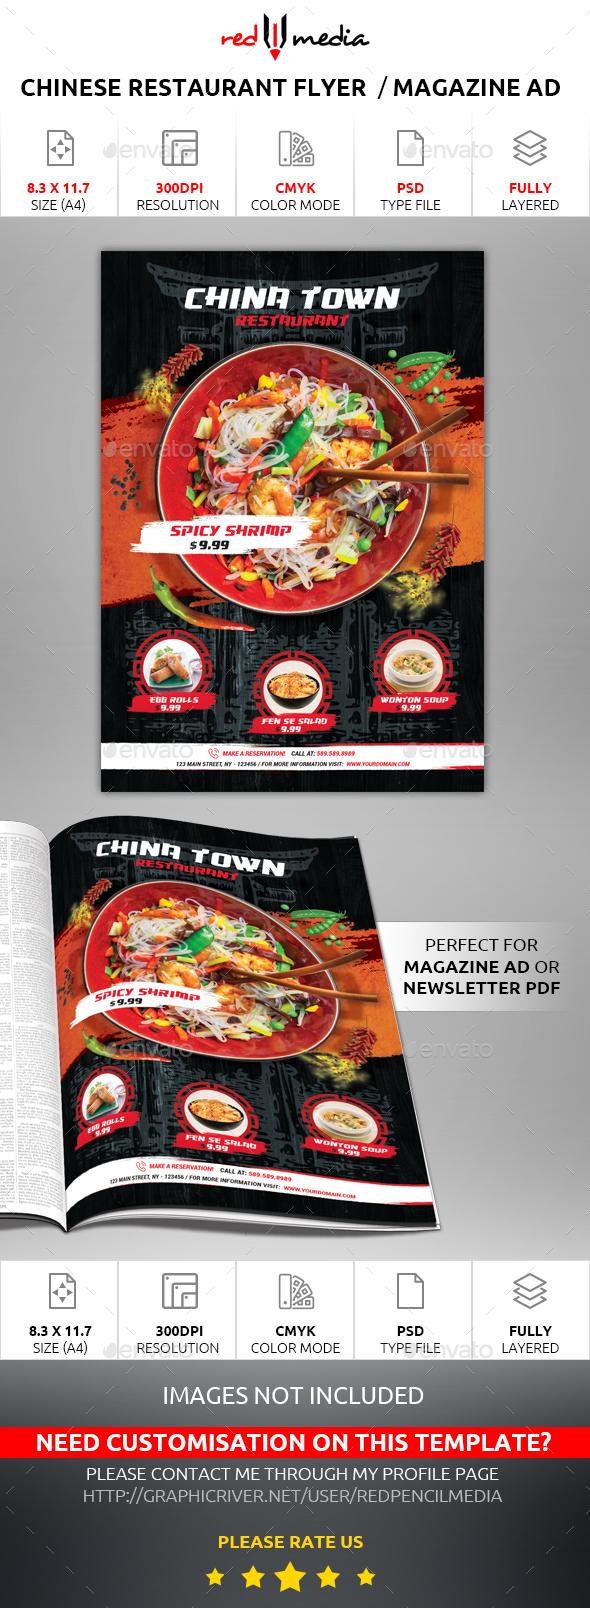 Chinese Restaurant Flyer / Magazine AD - Restaurant Flyers